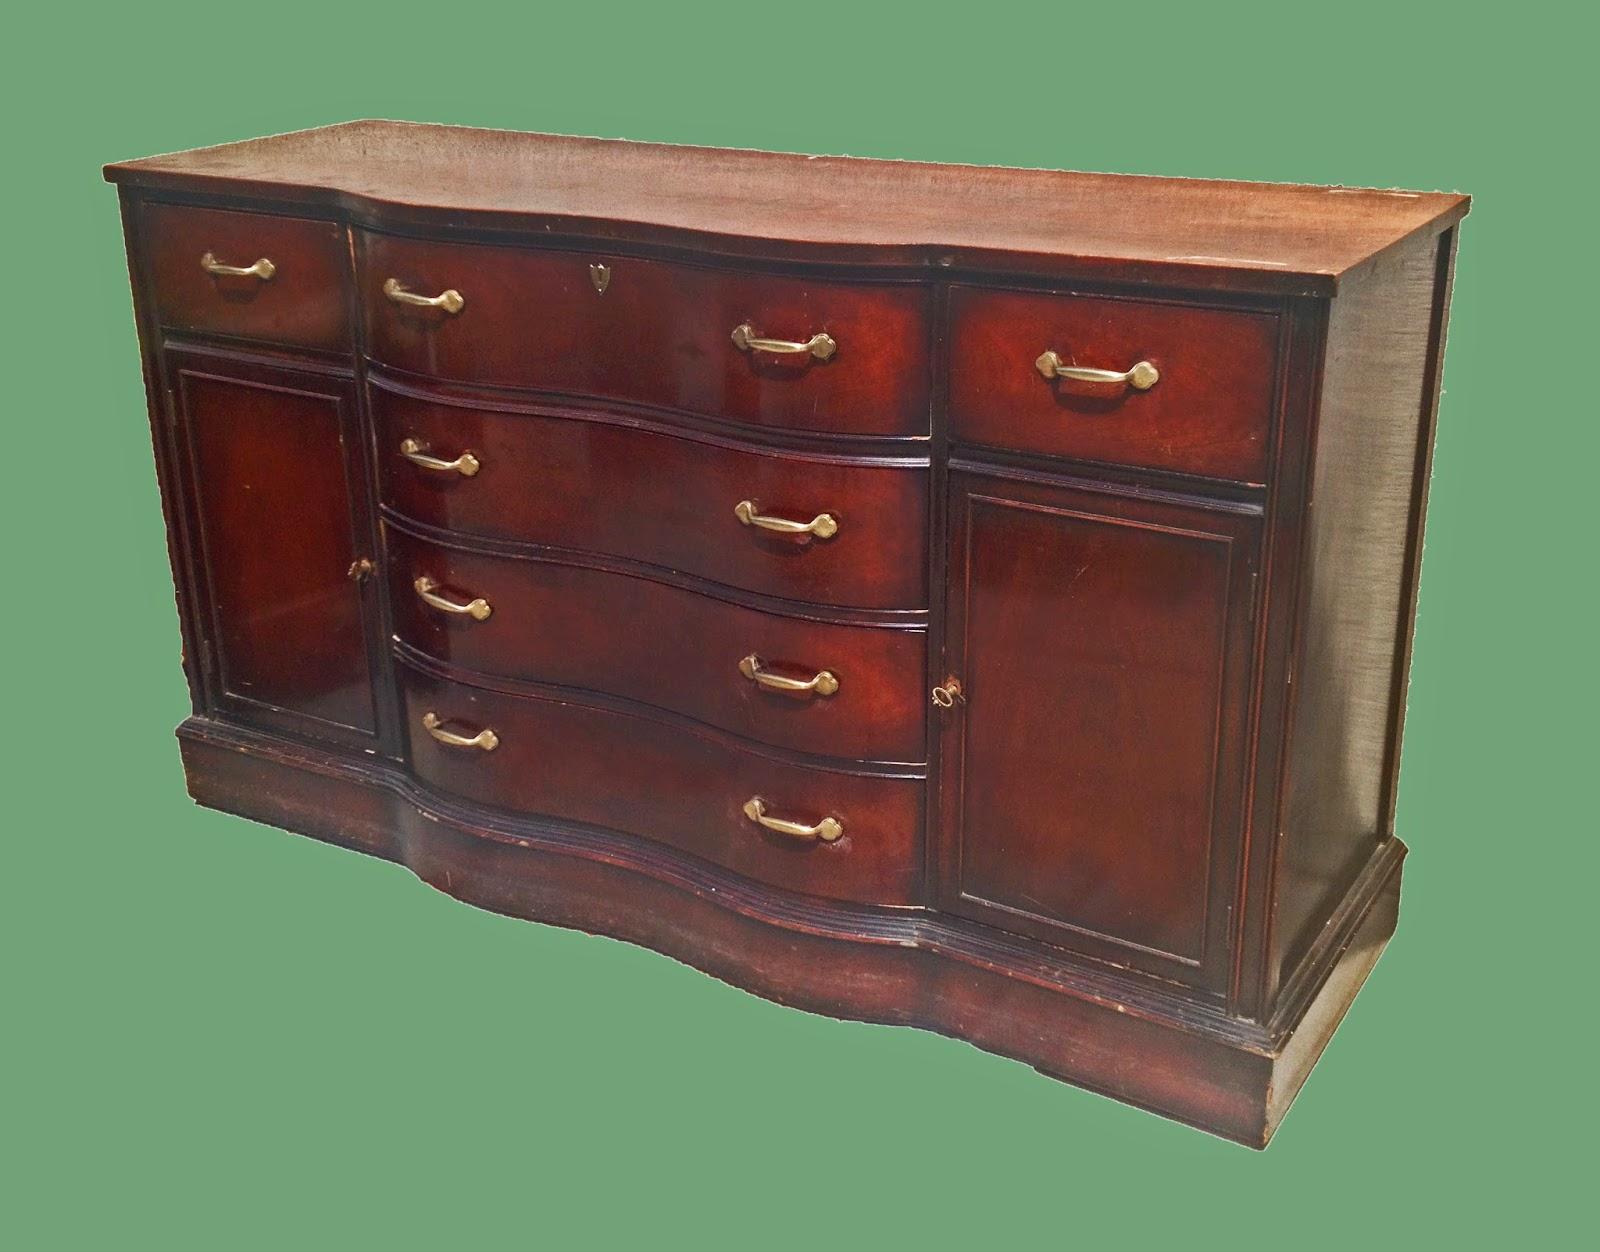 uhuru furniture collectibles mahogany buffet 95 75 sold. Black Bedroom Furniture Sets. Home Design Ideas